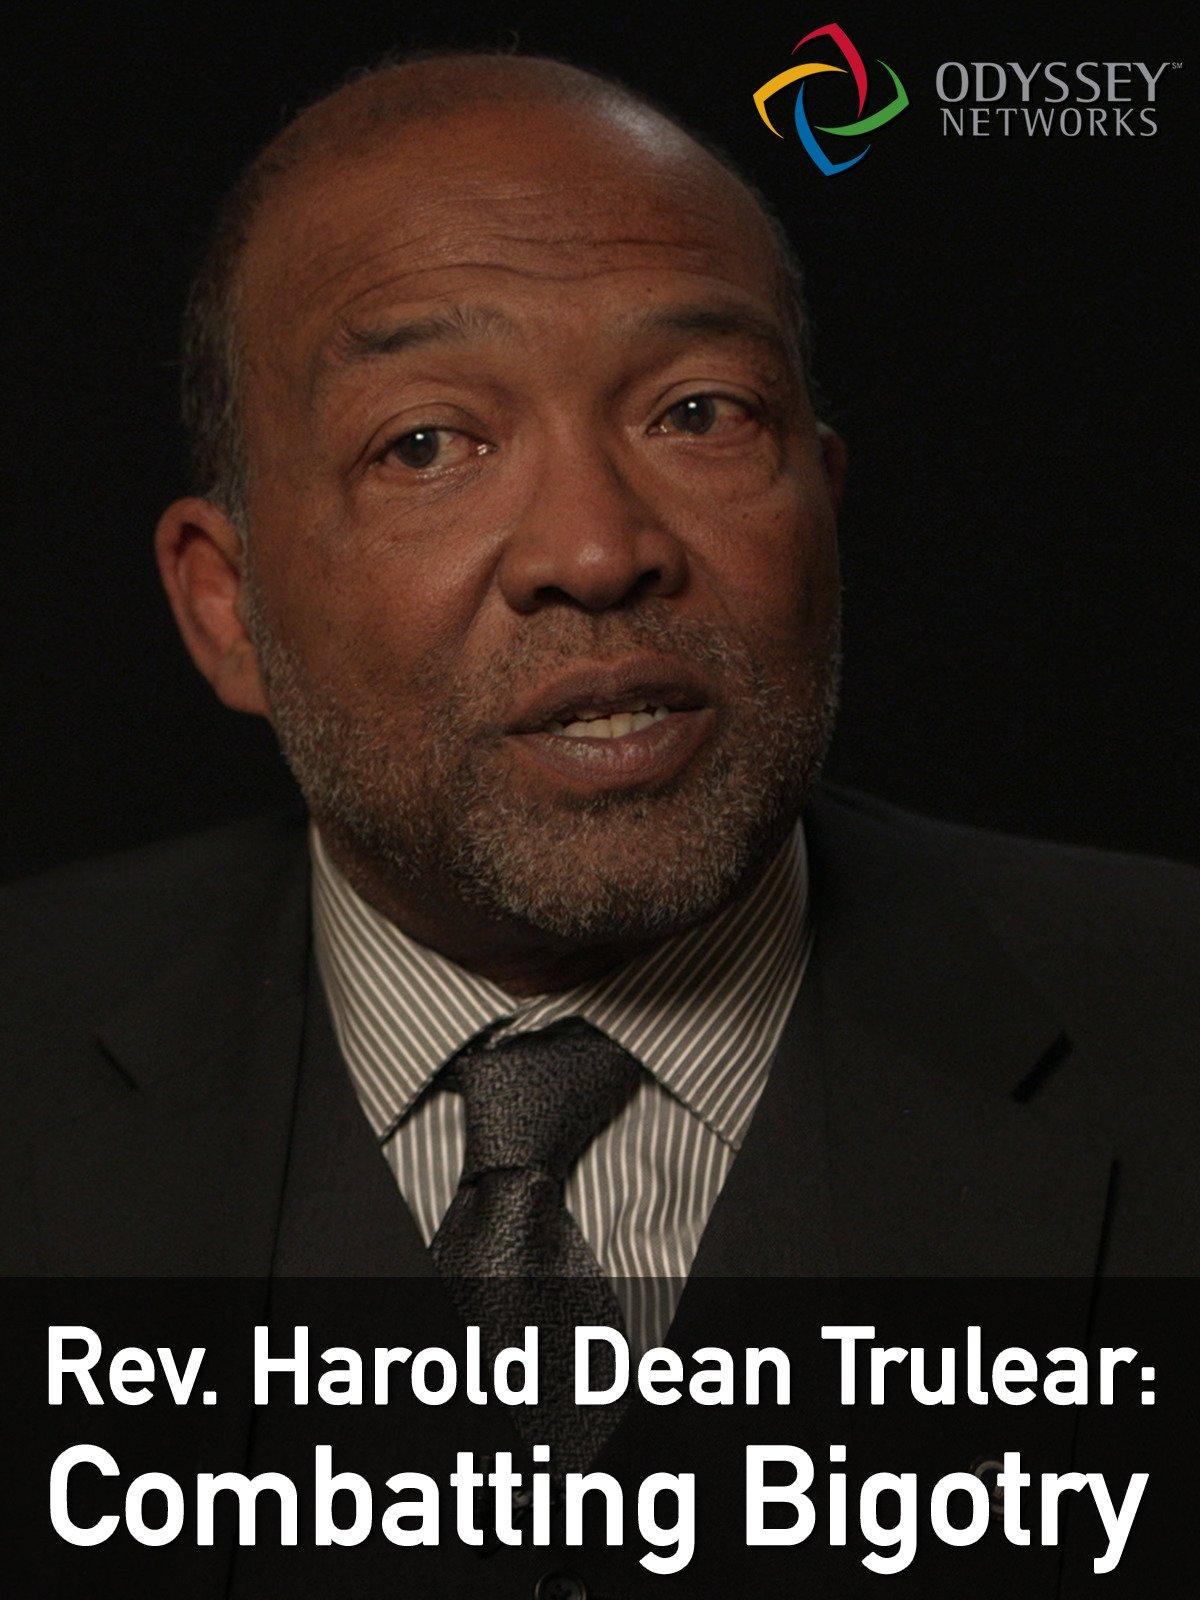 Clip: Rev. Harold Dean Trulear: Combatting Bigotry